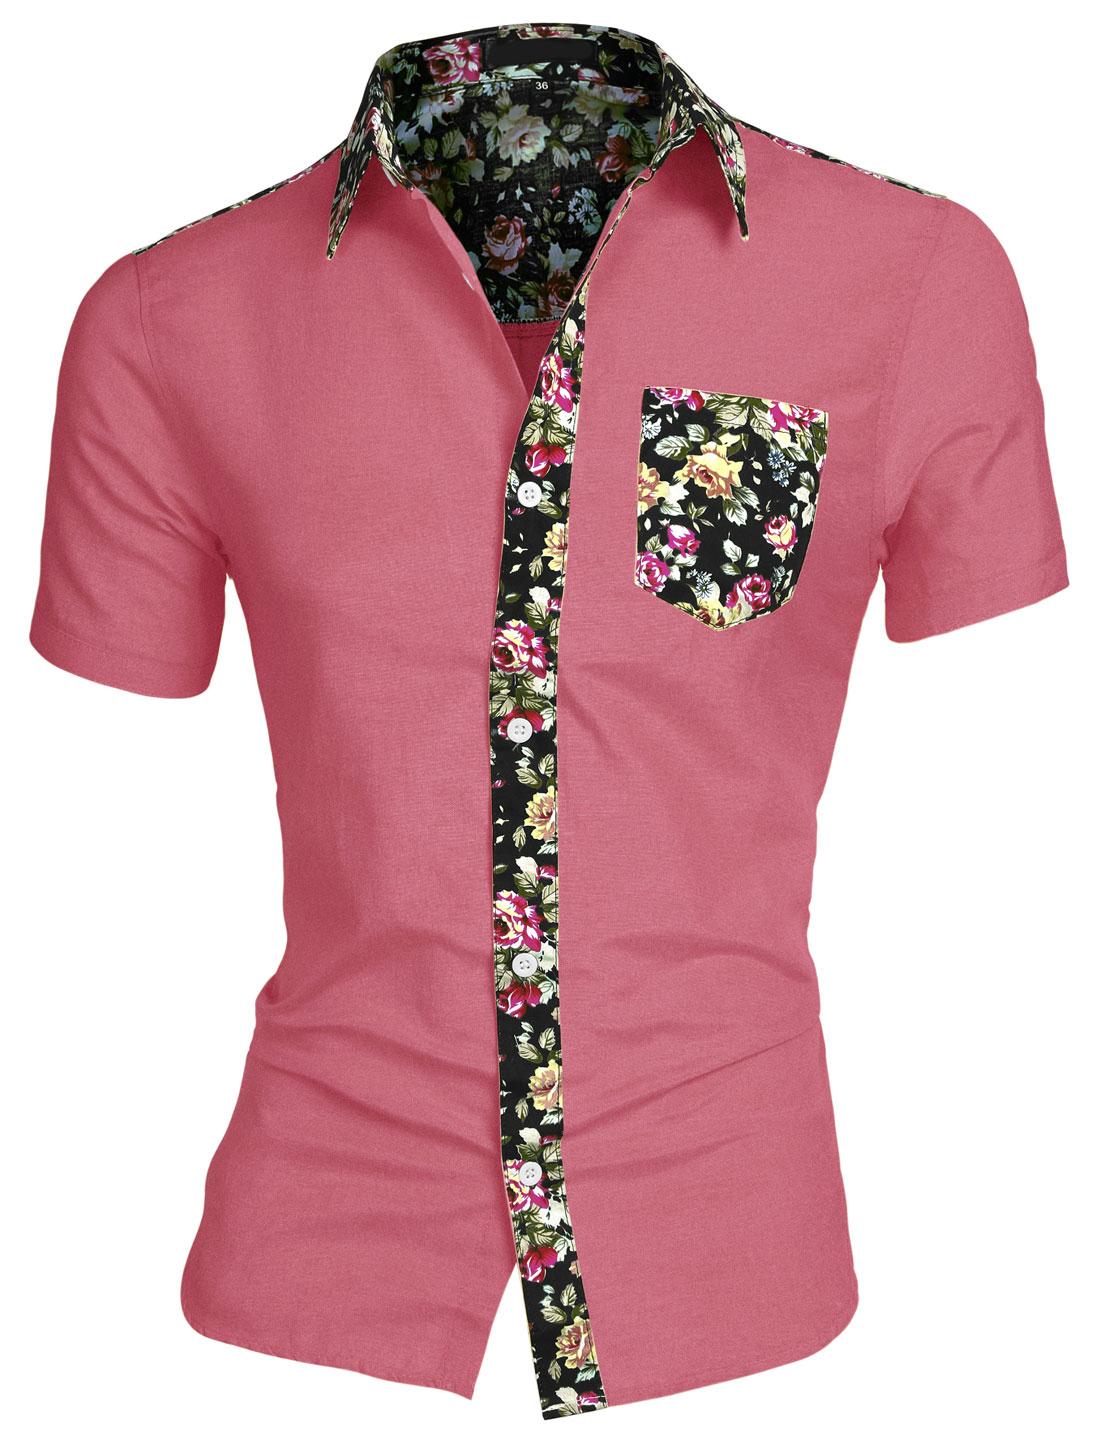 Men Round Hem Floral Print Chest Pocket Short Sleeve Button Down Shirt Fuchsia S